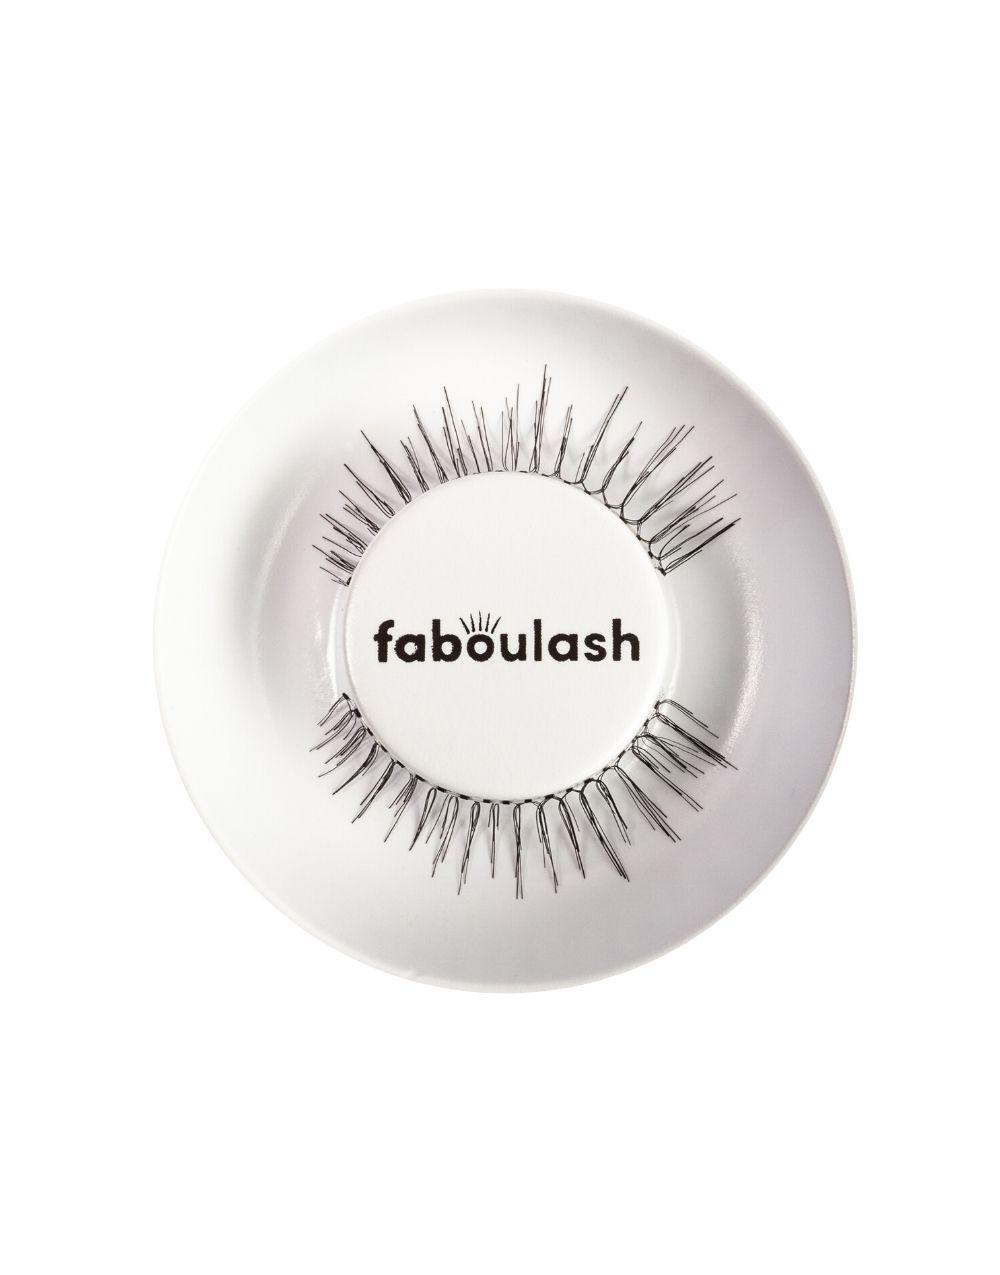 Faboulash 101 by Faboulash